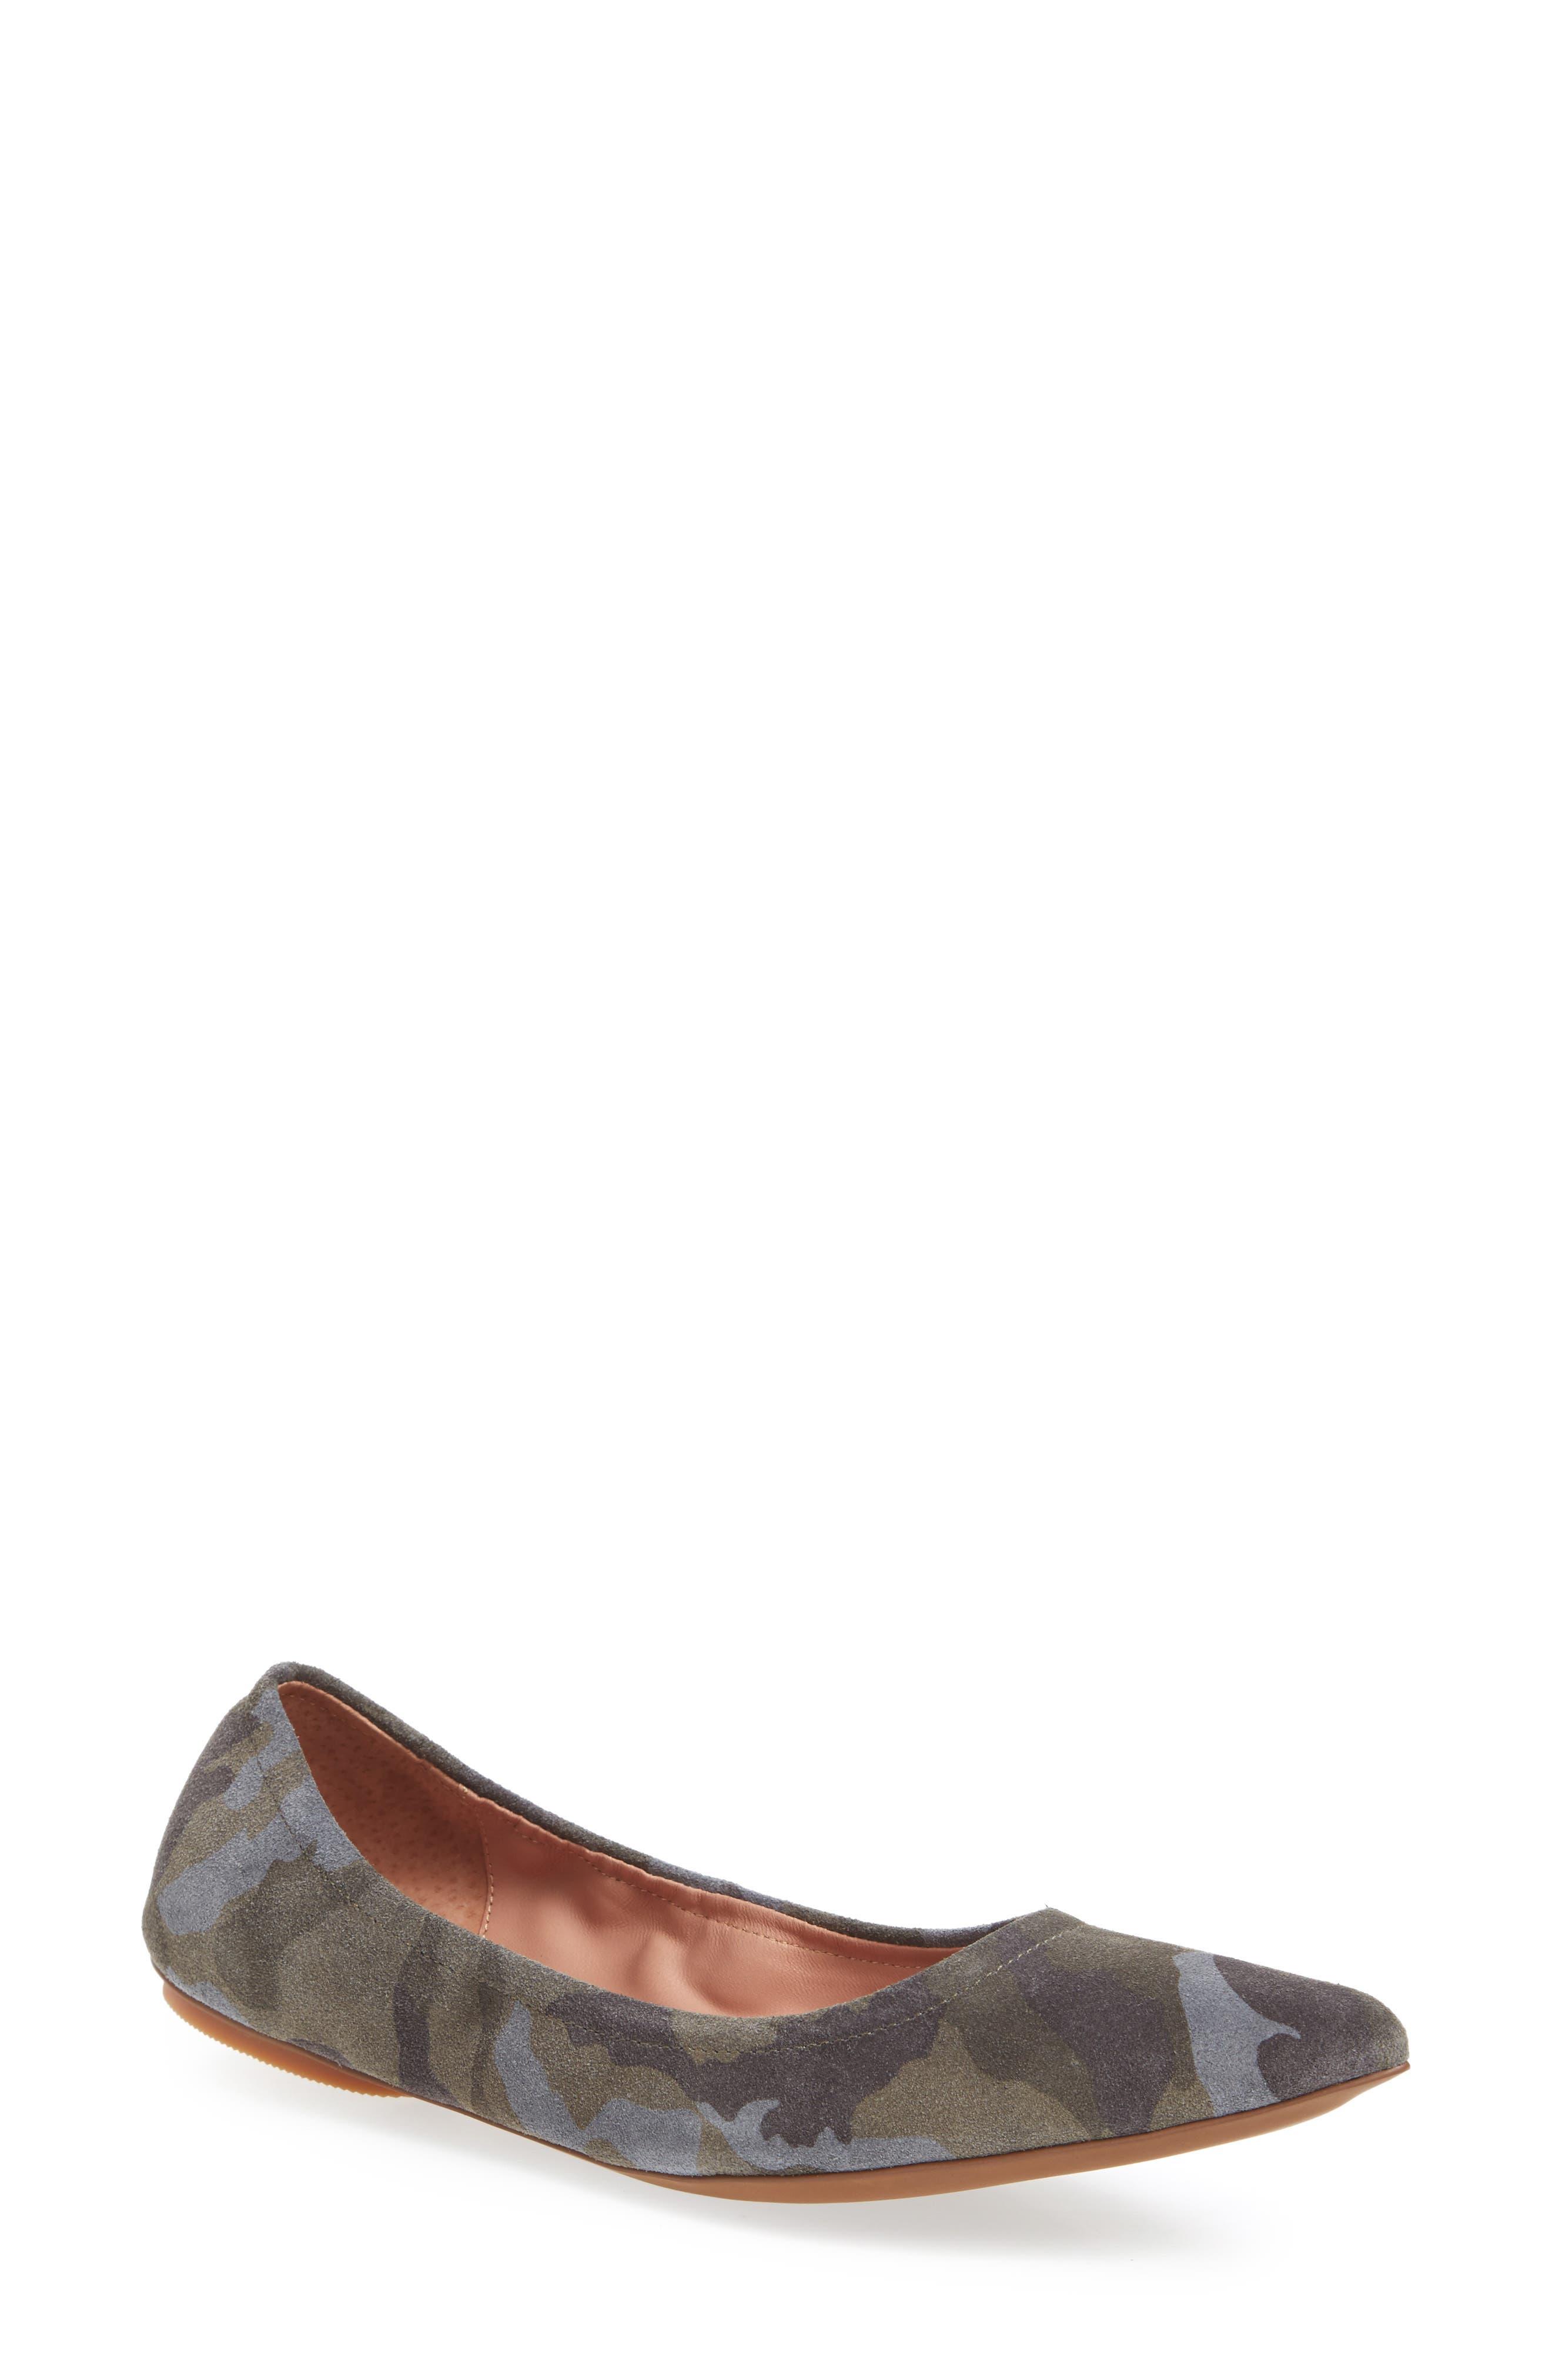 Main Image - Linea Paolo Nico Pointy Toe Flat (Women)